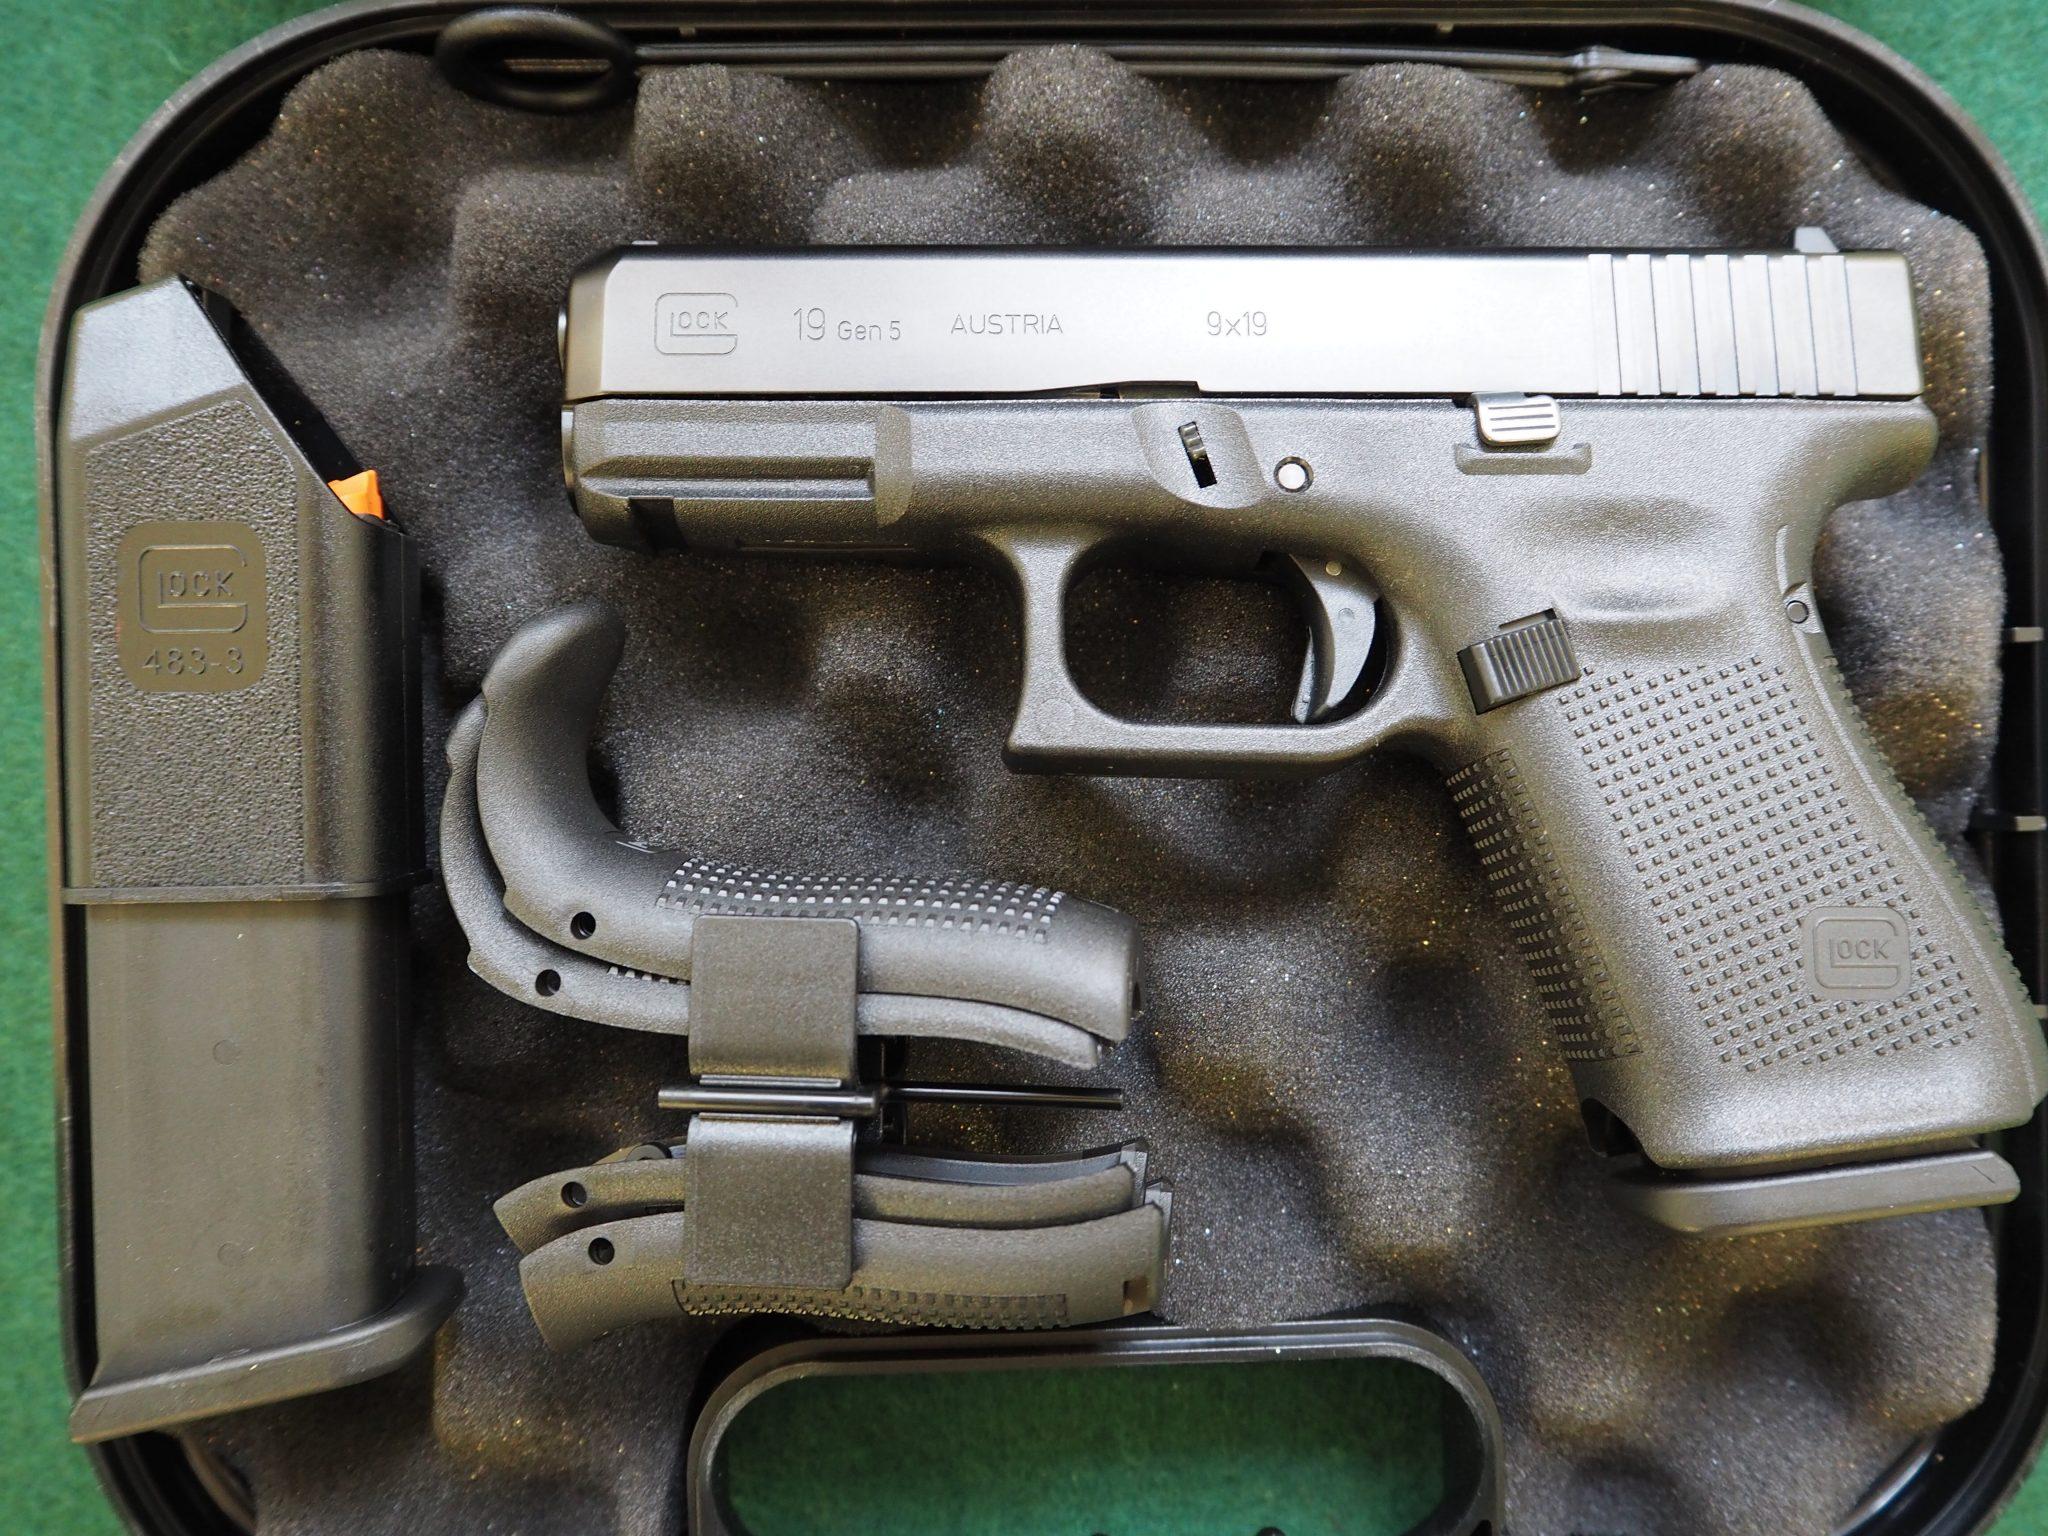 Glock 19 Gen 5 (dzt. ausverkauft!)